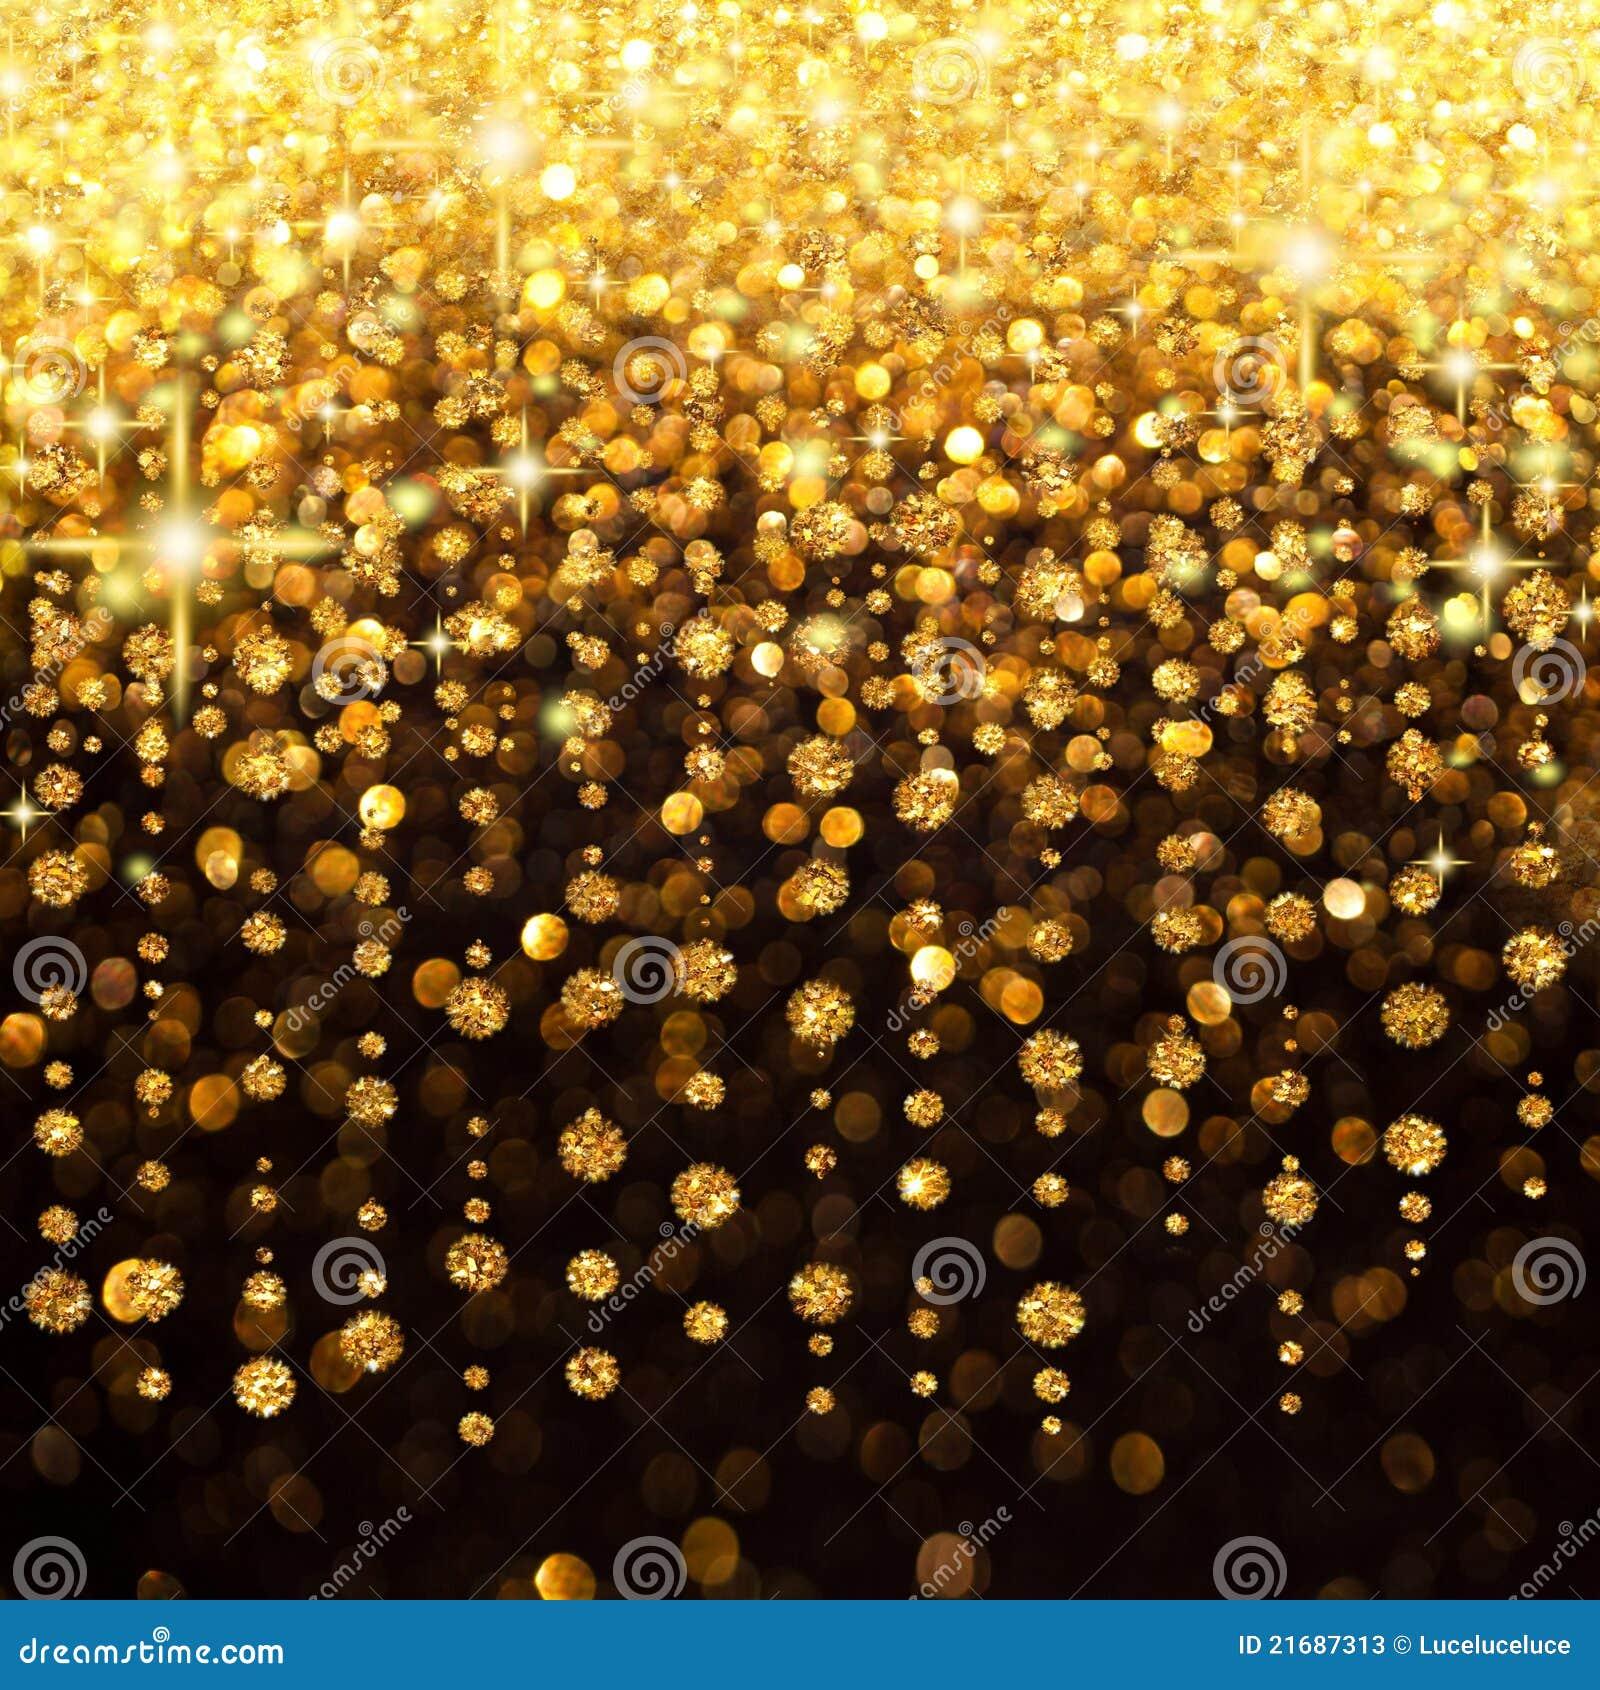 gold lights for christmas tree